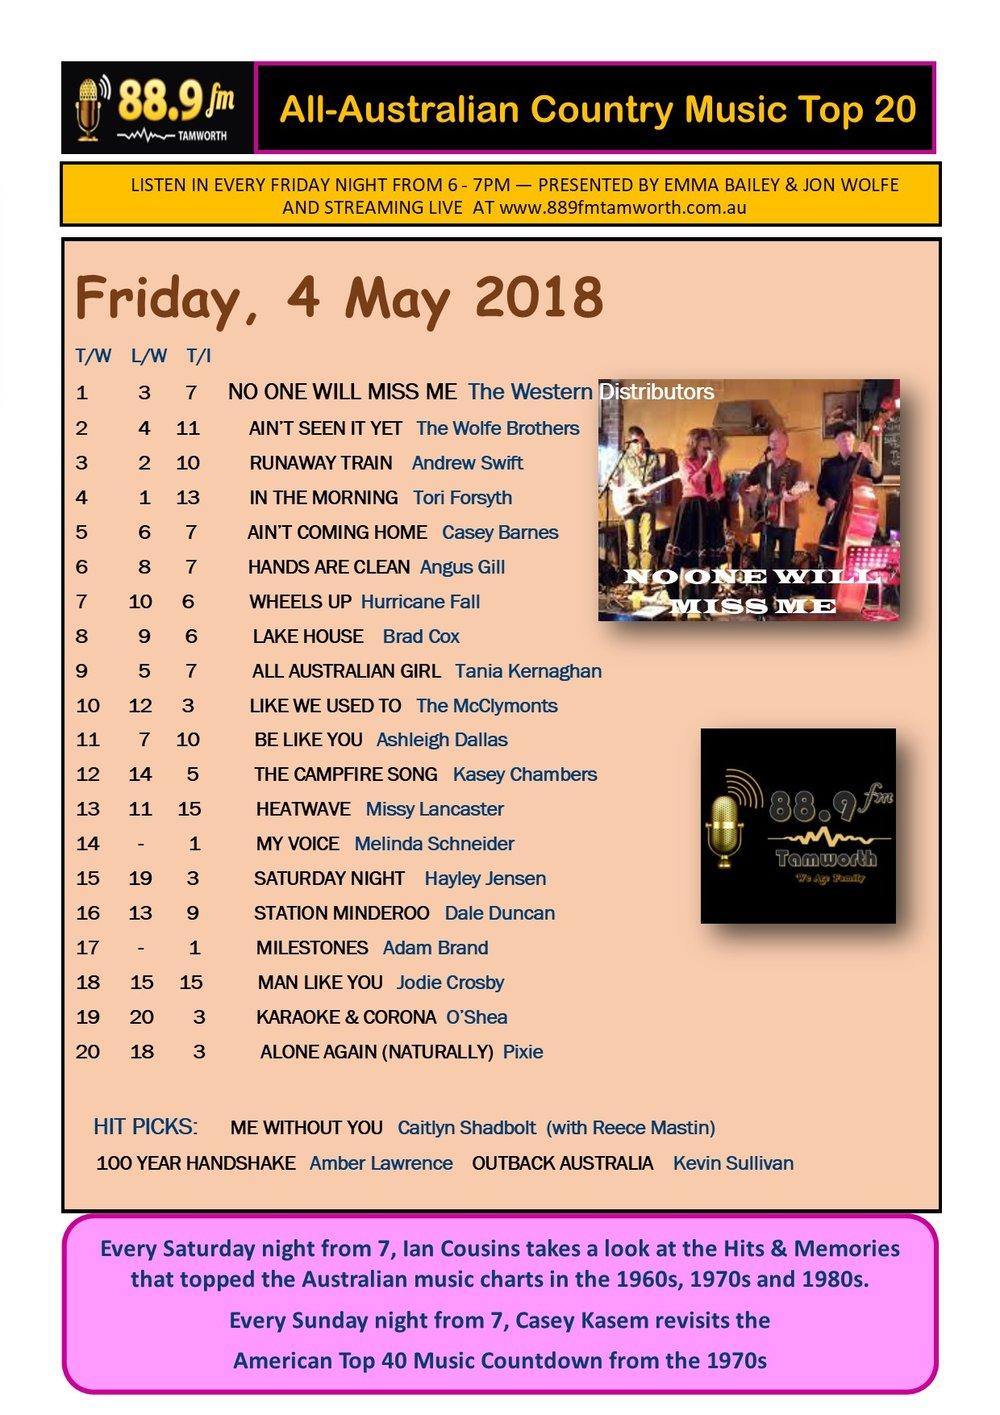 889FM CHART 4 May 2018 (2).jpg